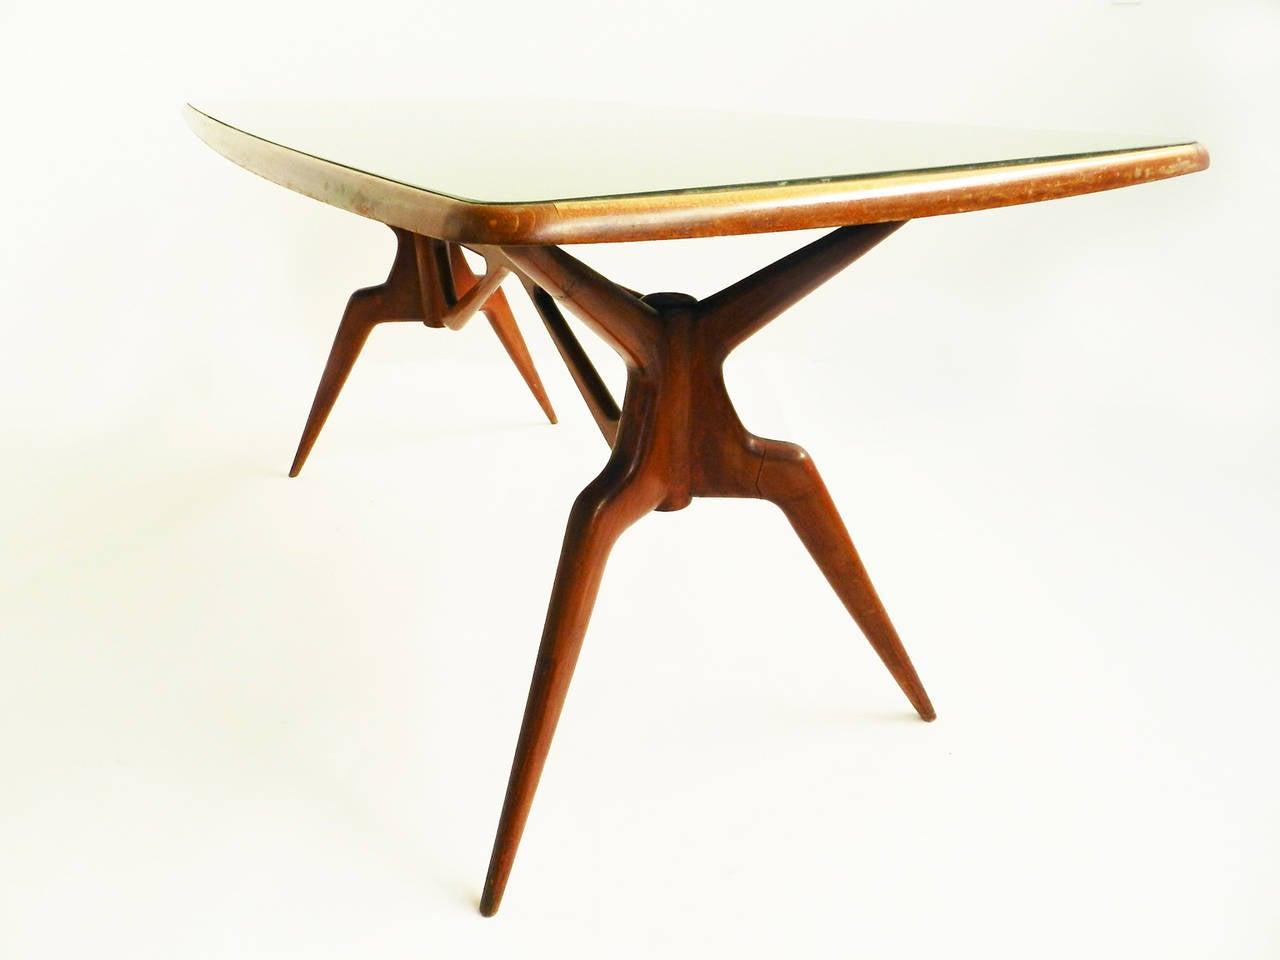 rare dining table attributed to ico parisi ariberto colombo 1950